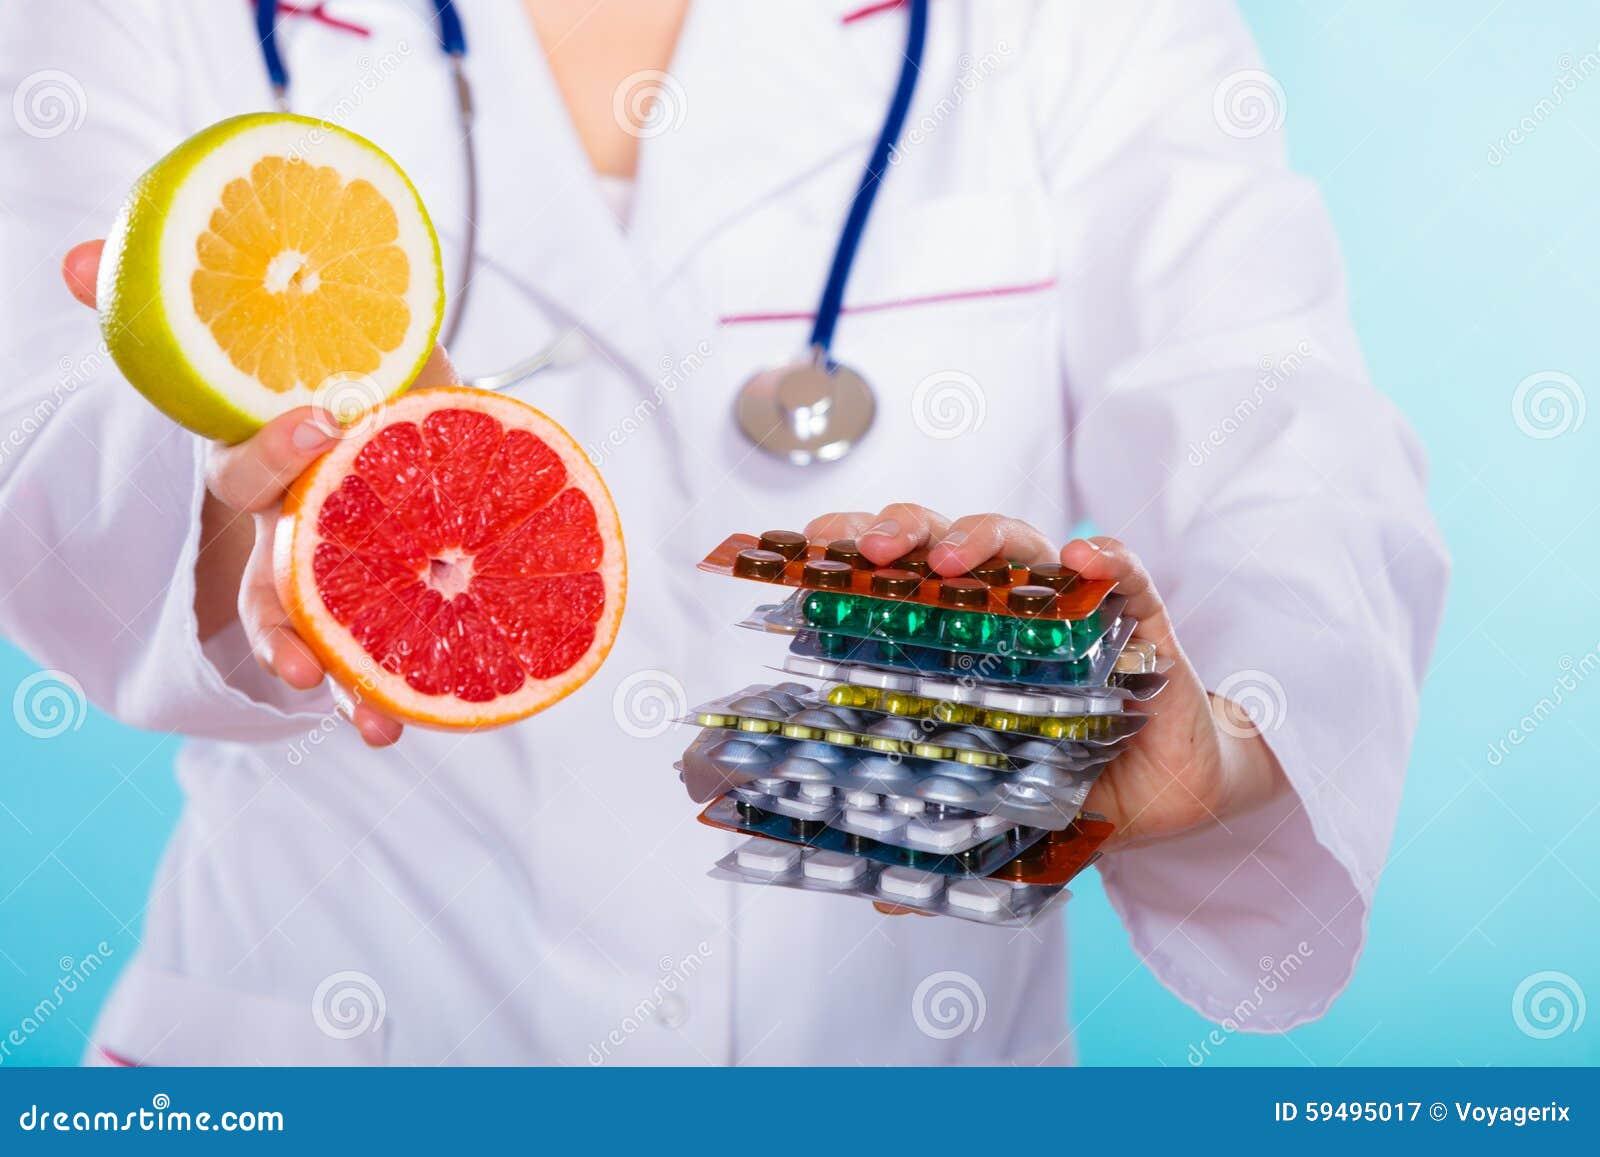 Nopalina weight loss pills picture 3